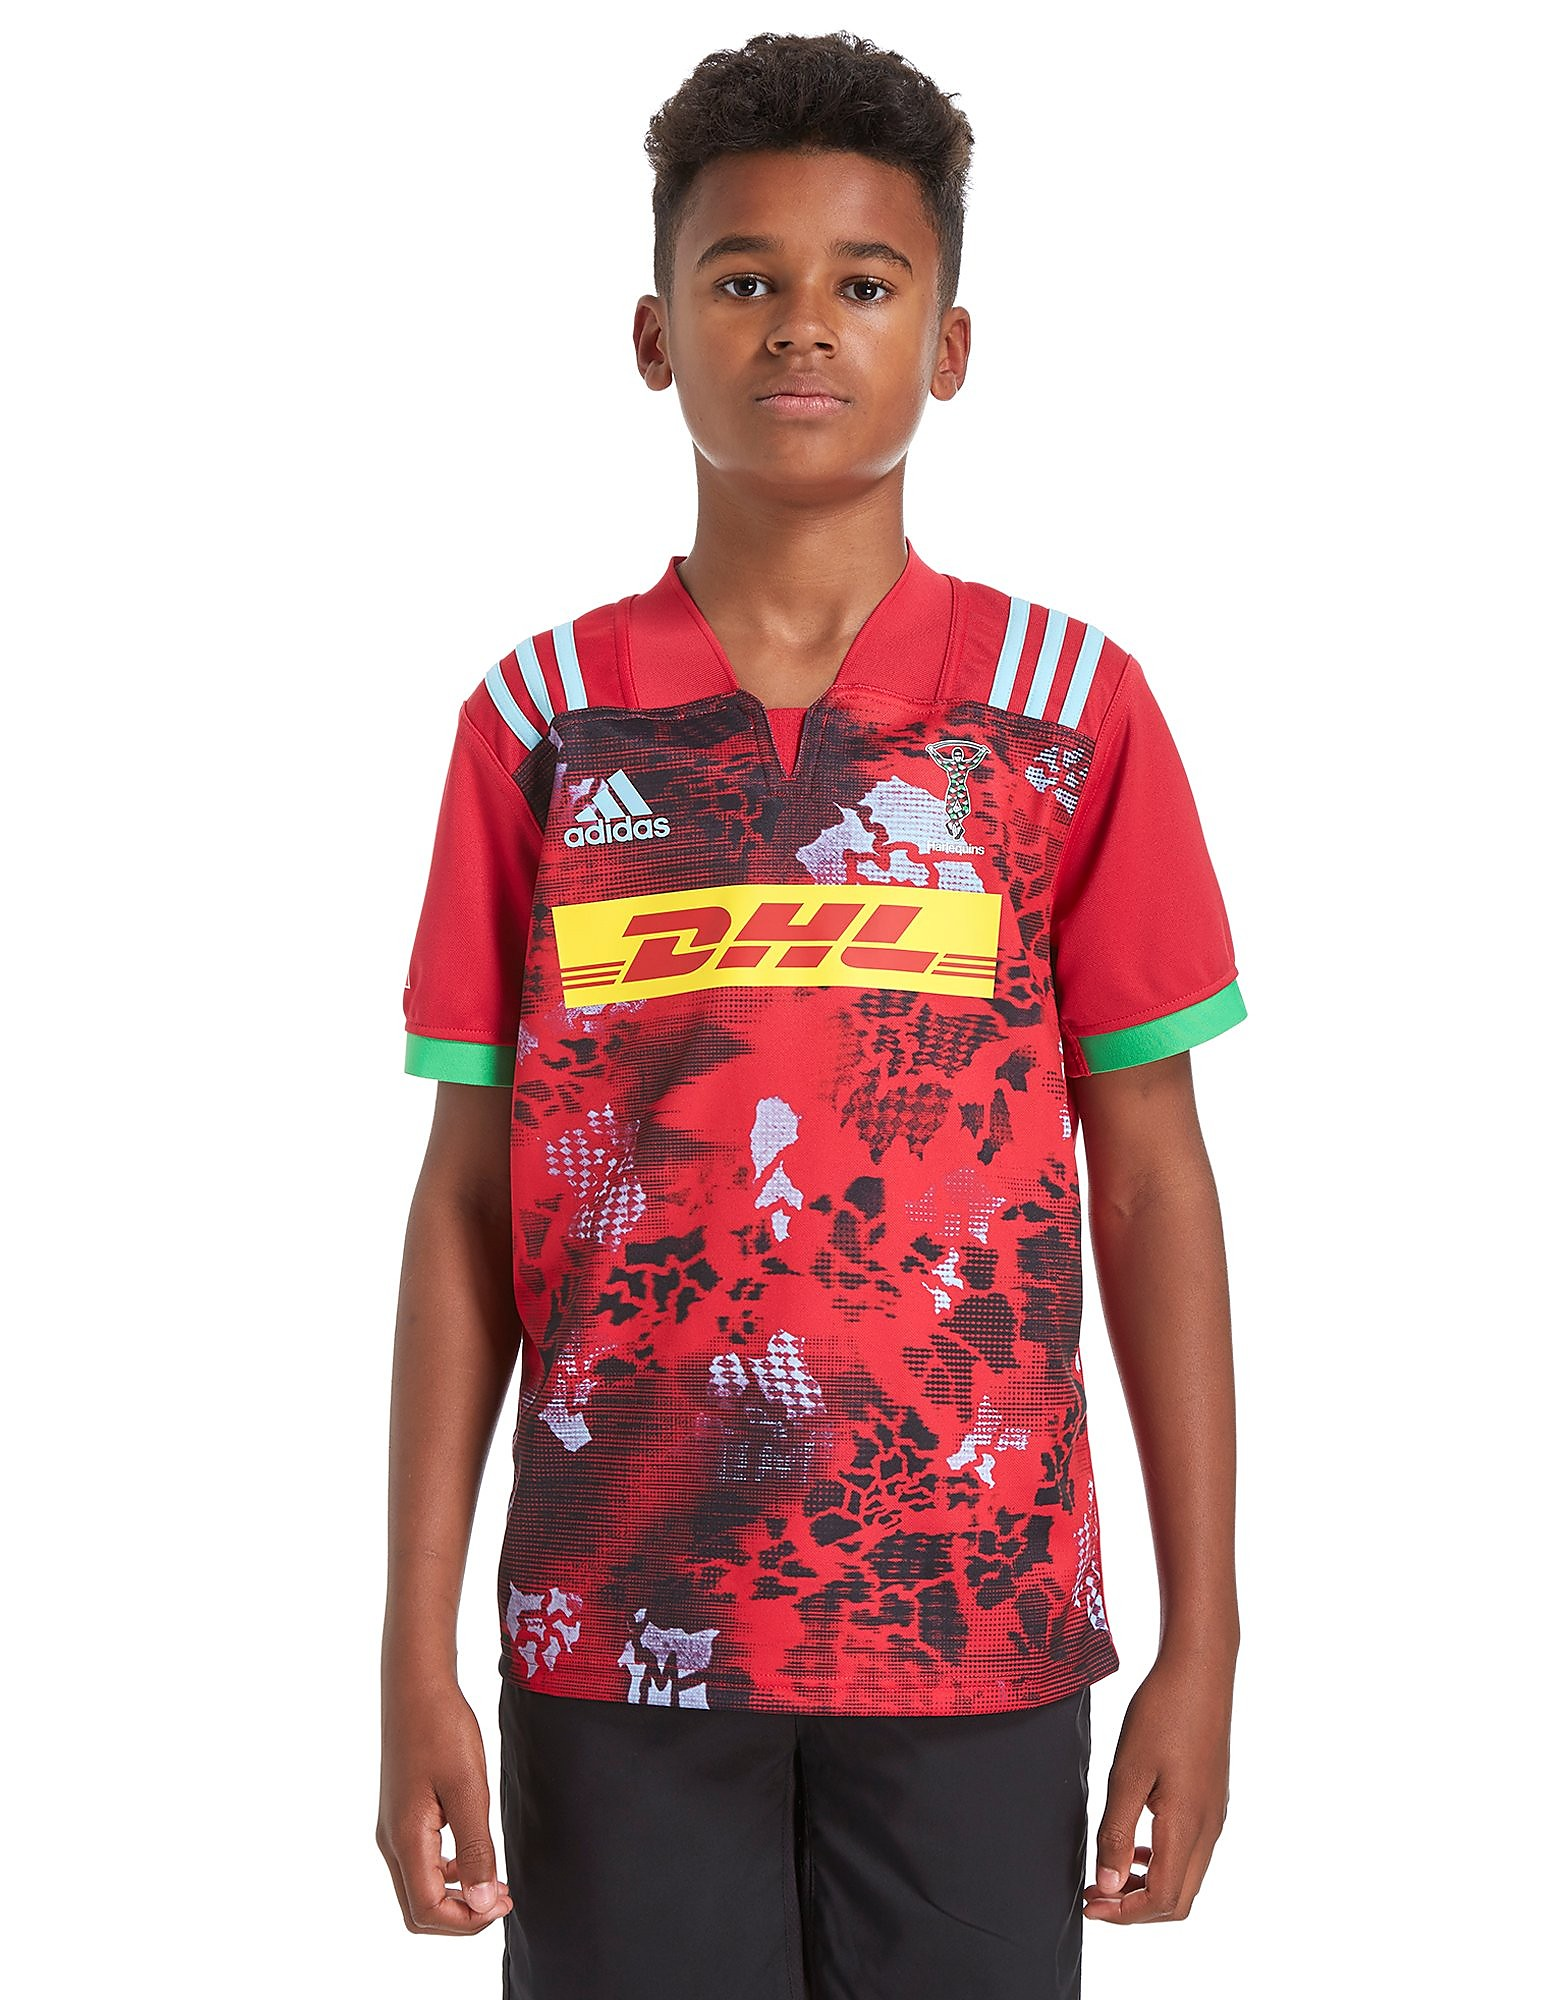 adidas Harlequins 2017/18 Away Shirt Junior